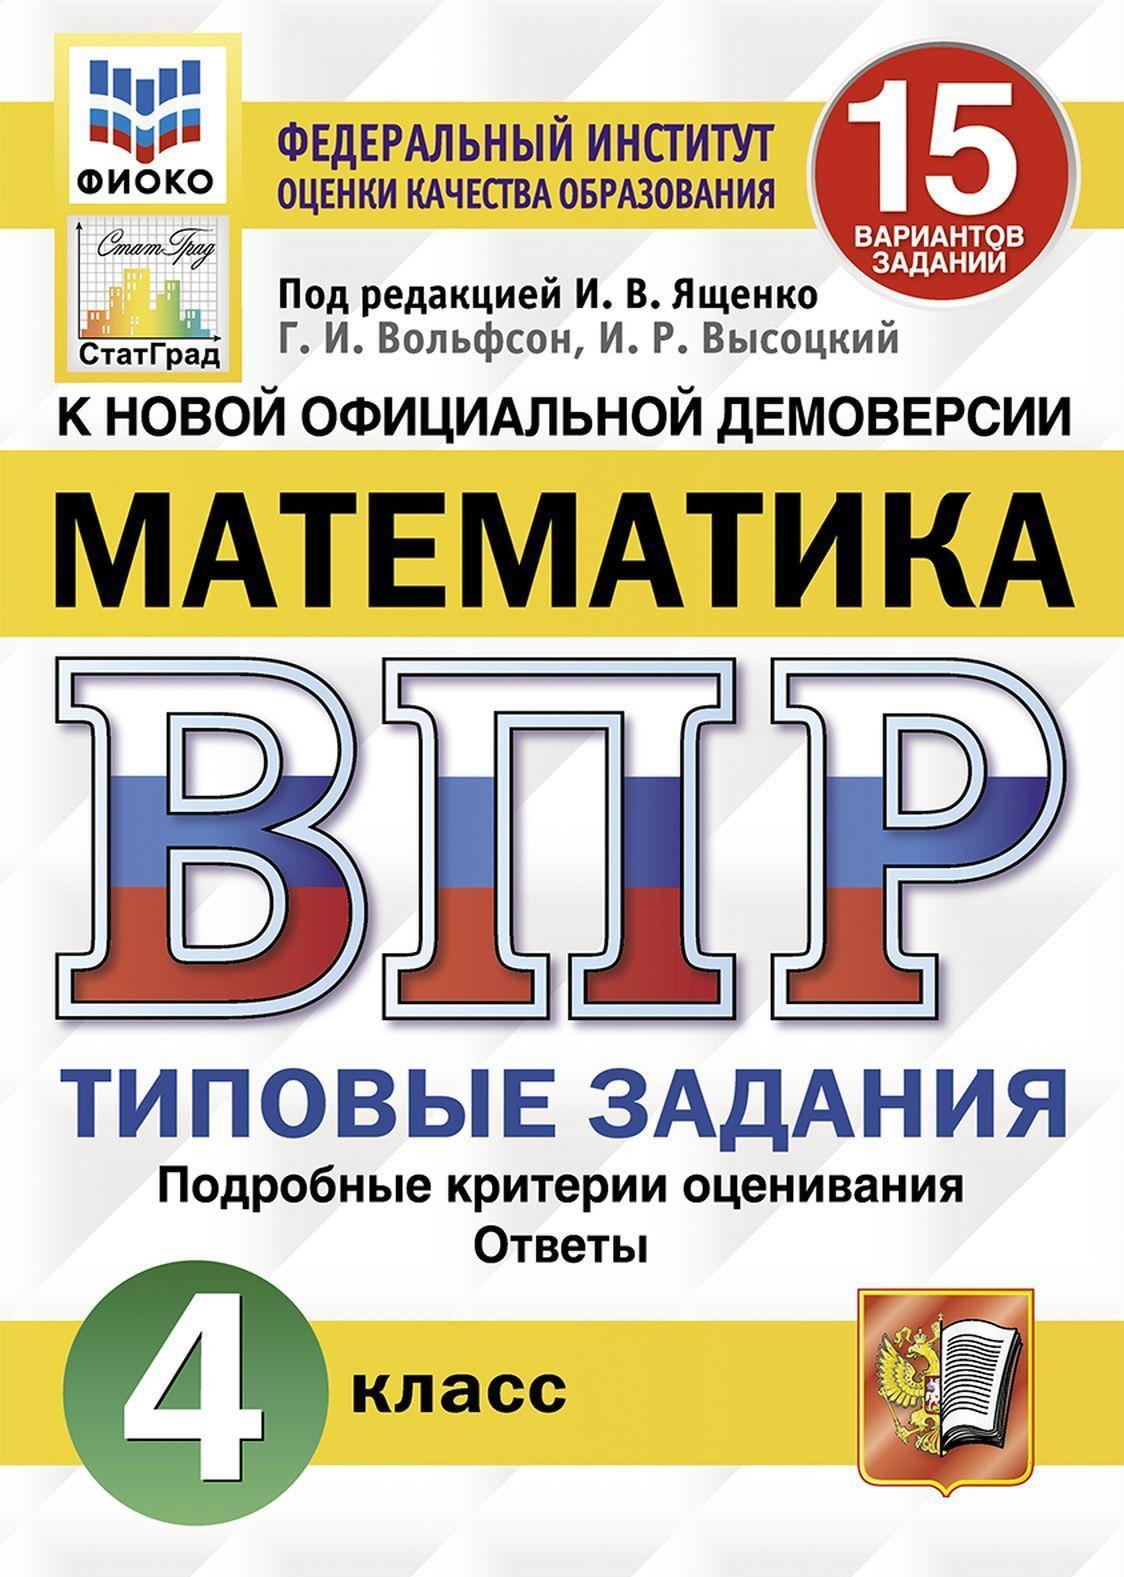 VPR. Matematika. 4 klass. Tipovye zadanija. 15 variantov